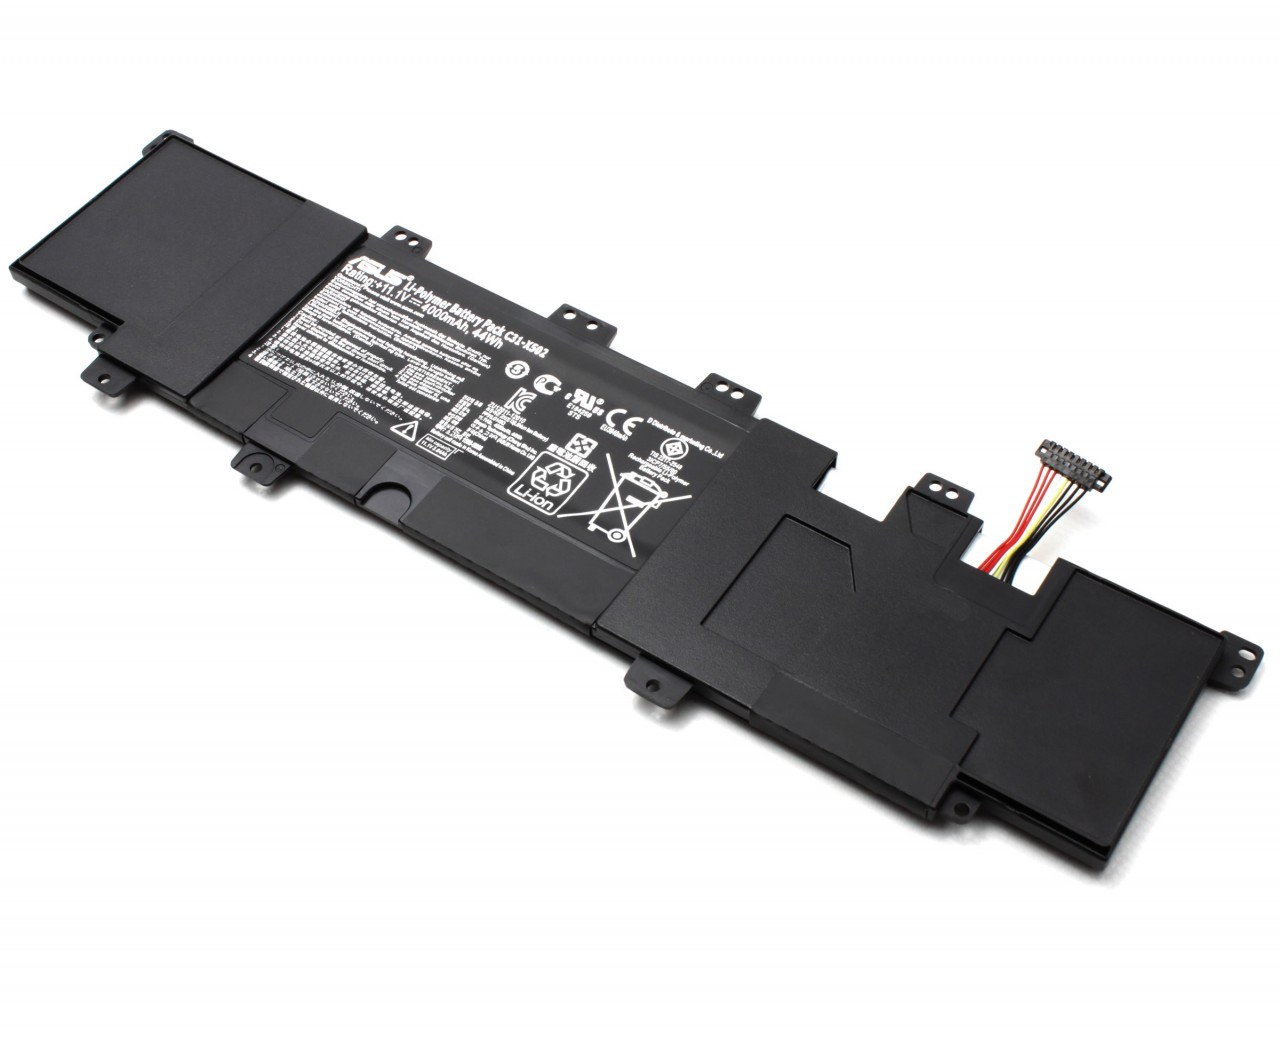 Baterie Asus VivoBook S500CA-DS51T Originala 44Wh imagine powerlaptop.ro 2021